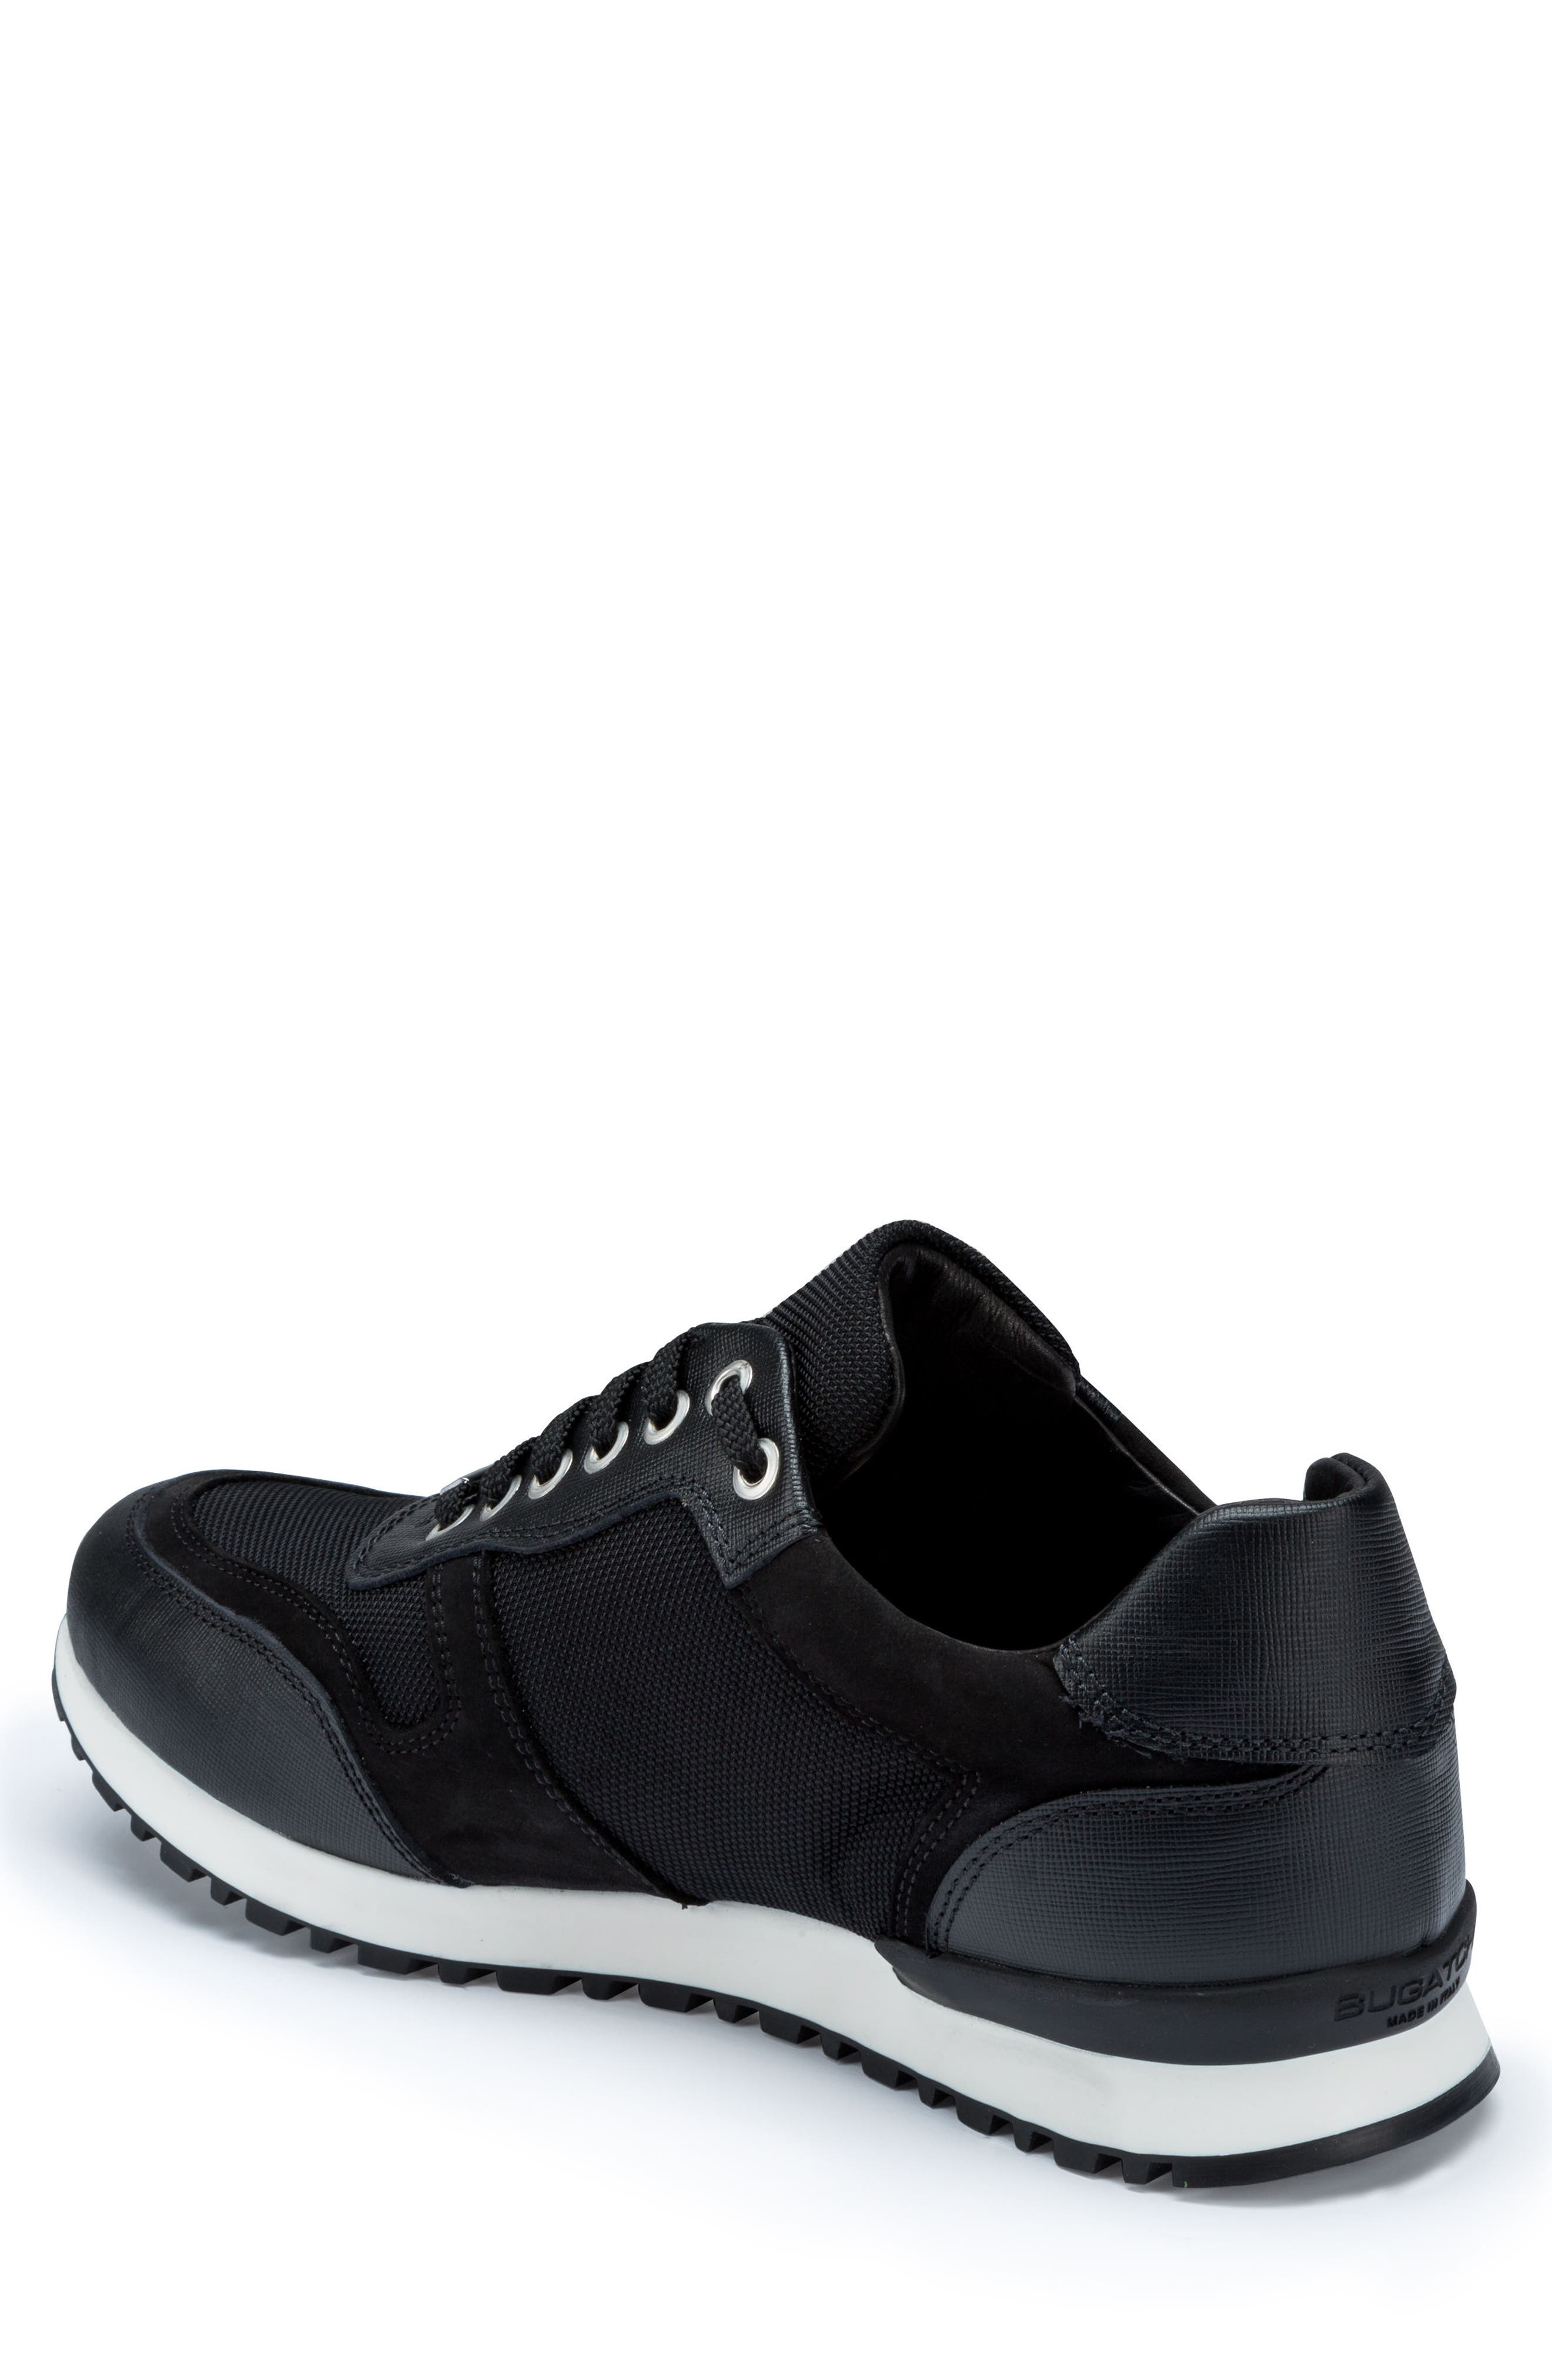 Modena Sneaker,                             Alternate thumbnail 2, color,                             Nero